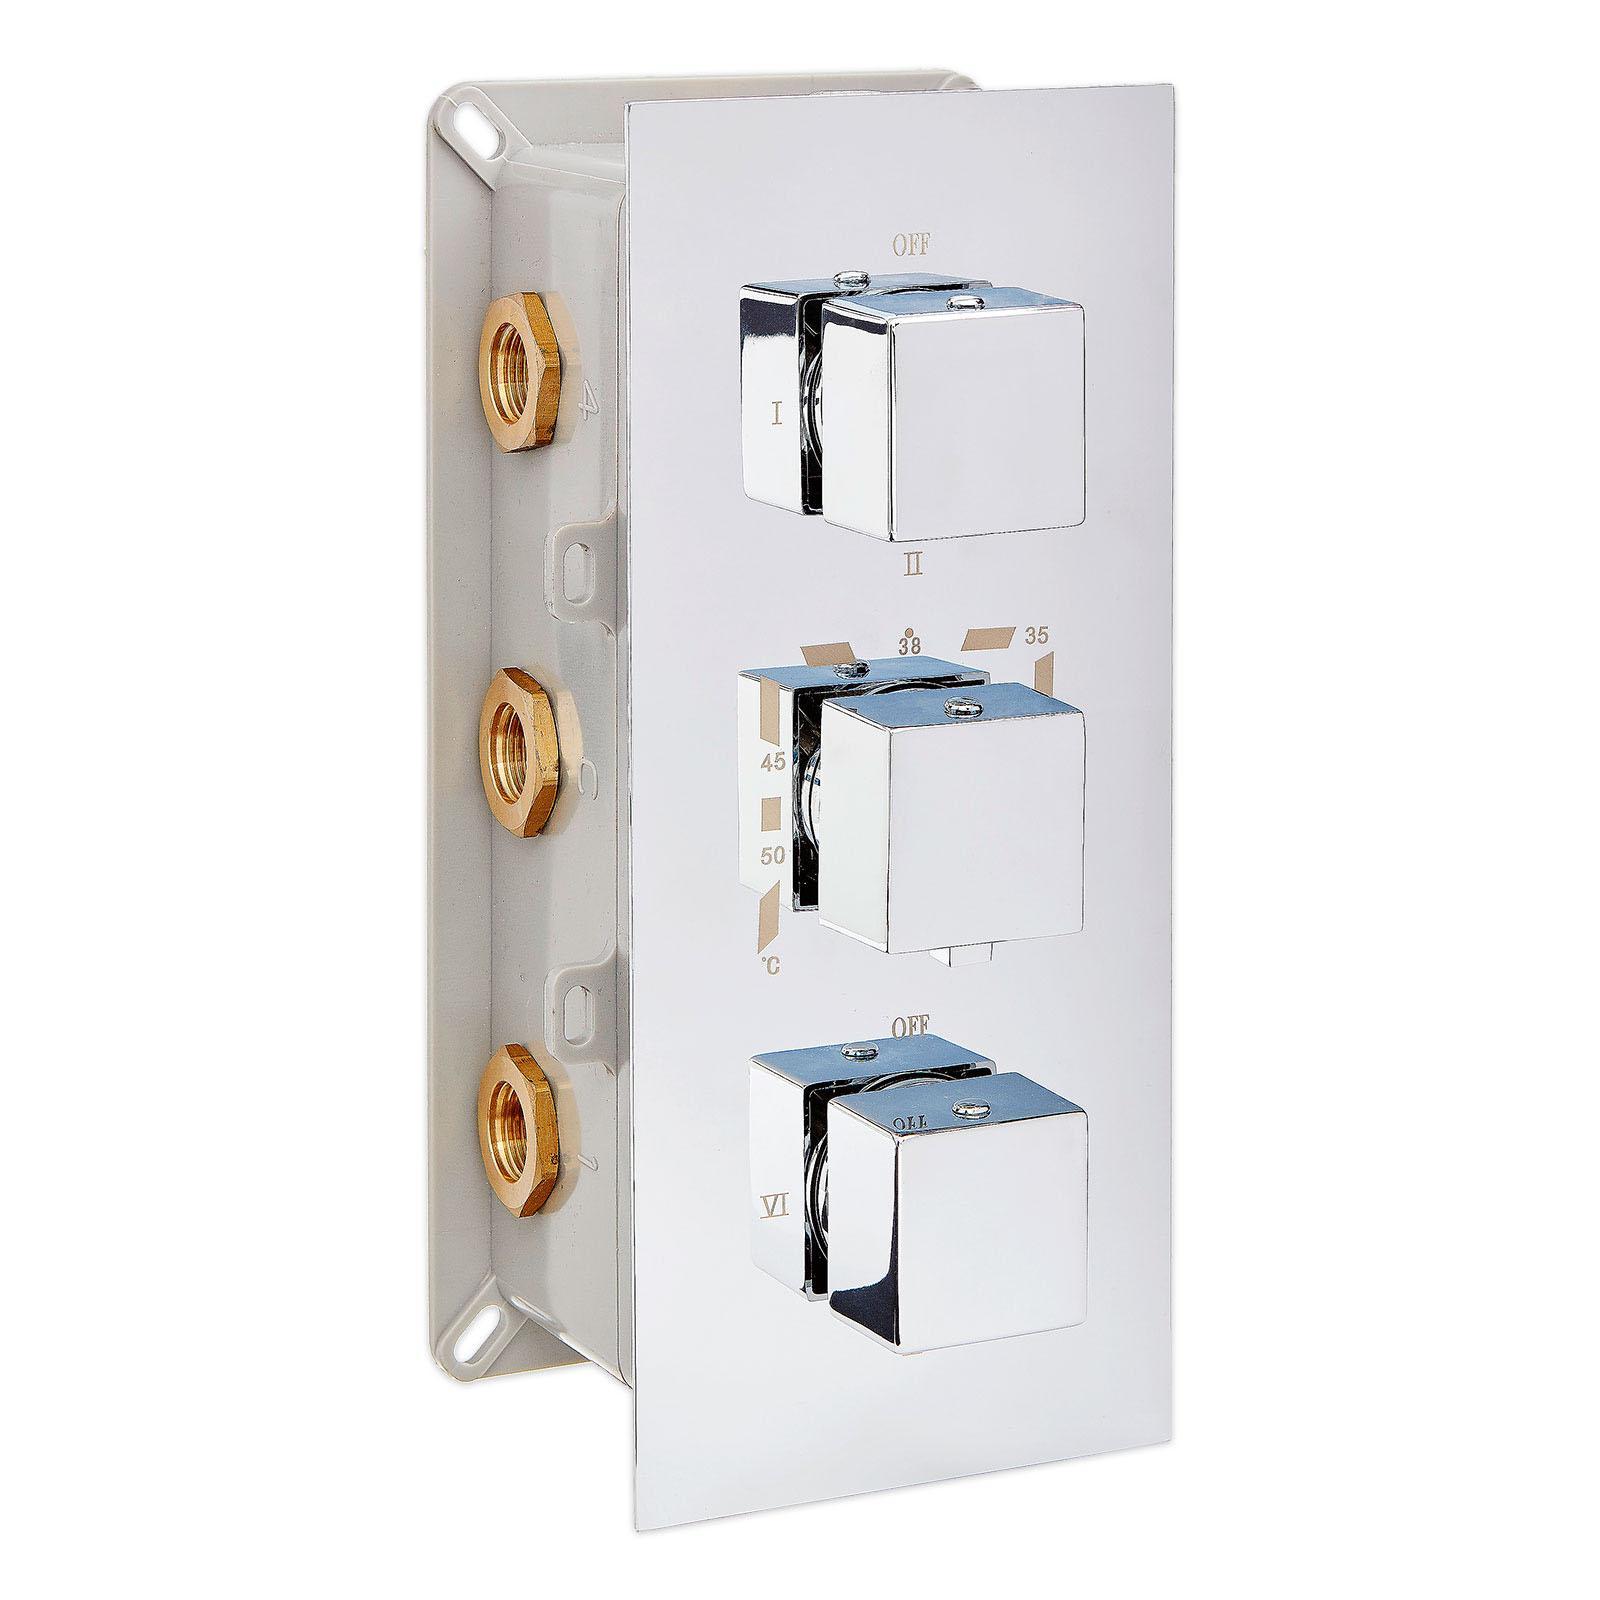 Thermostat-Unterputz-Duscharmatur UP11-02